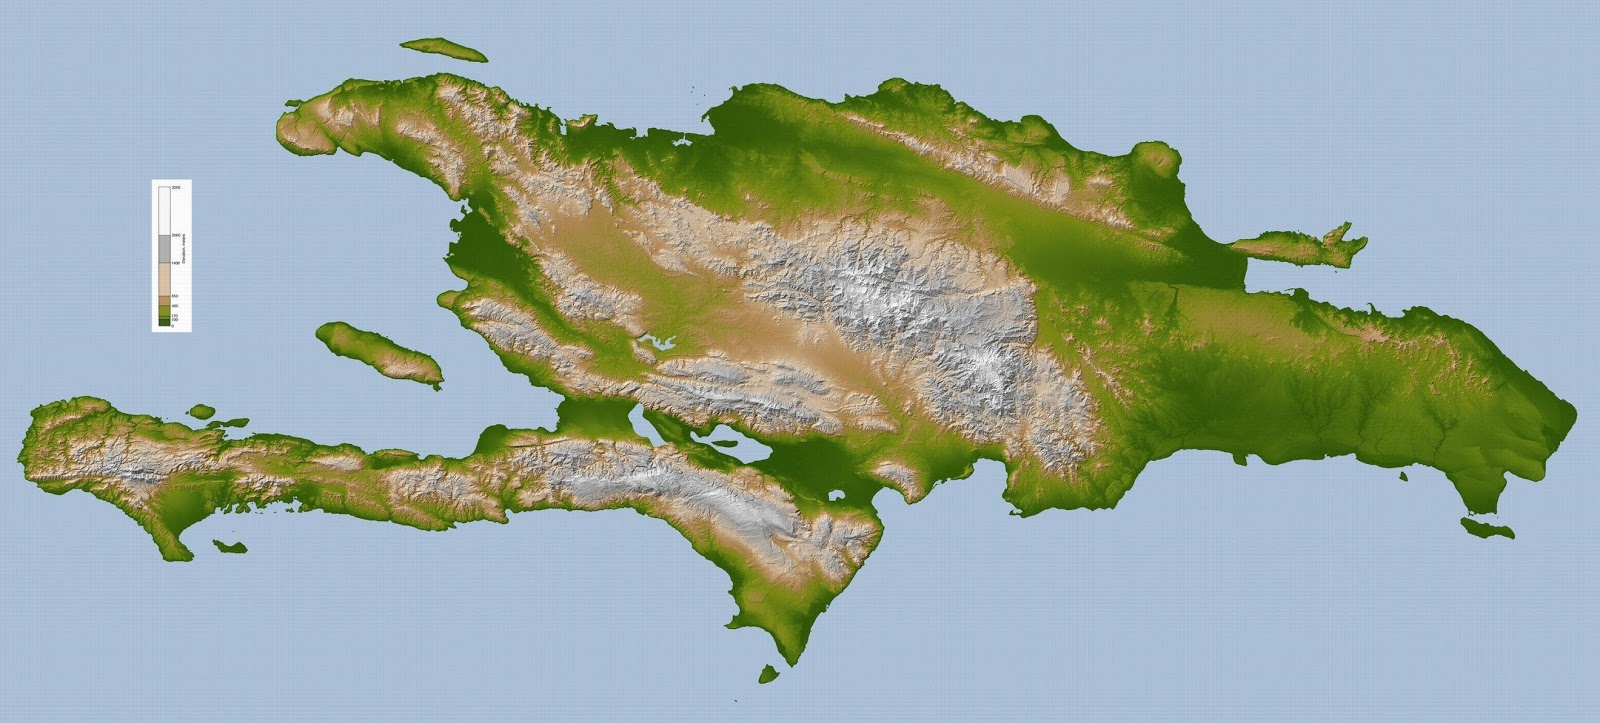 islas-cercanas-a-republica-dominicana